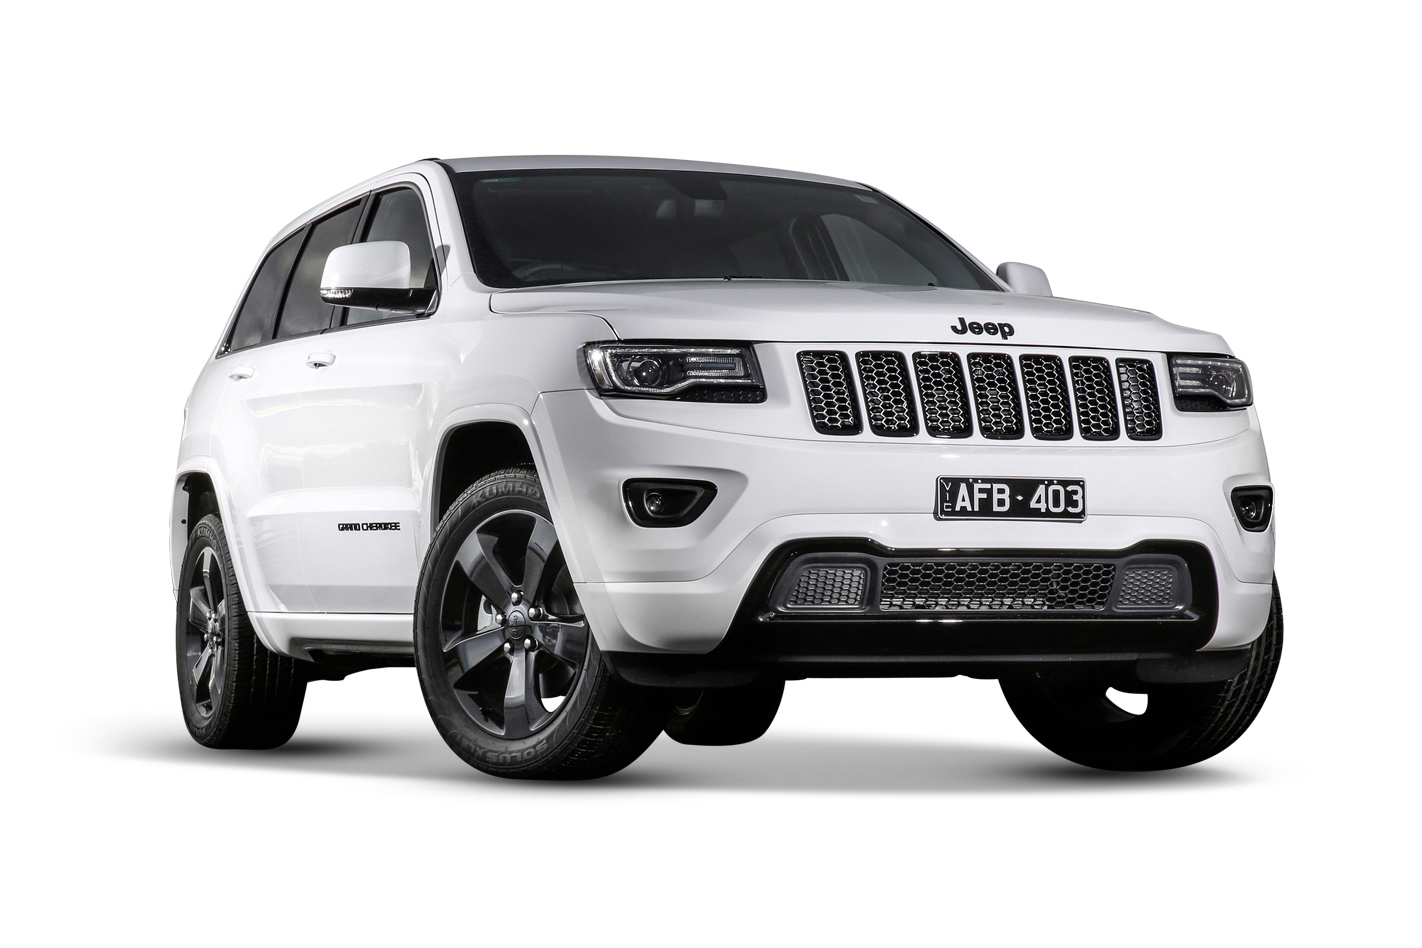 2017 Jeep Grand Cherokee Blackhawk 3 0l 6cyl Diesel Turbocharged Automatic Suv